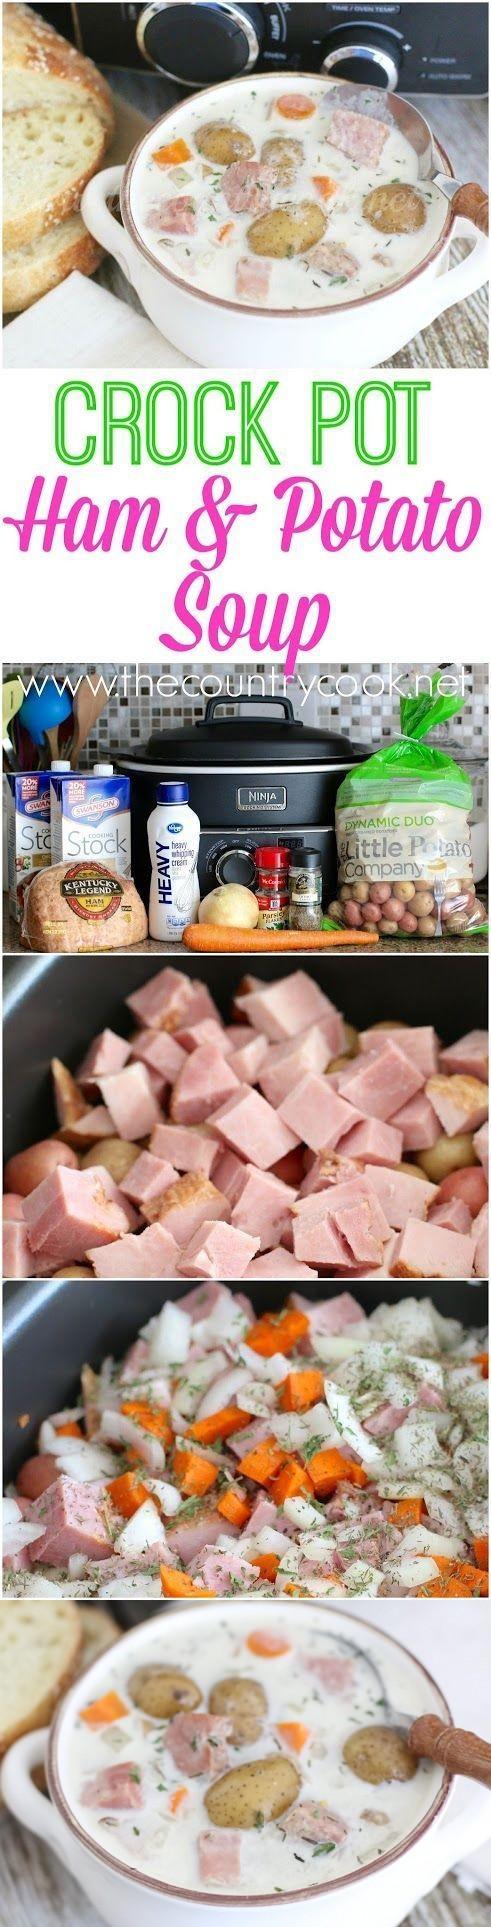 Crock Pot Potato and Ham Soup